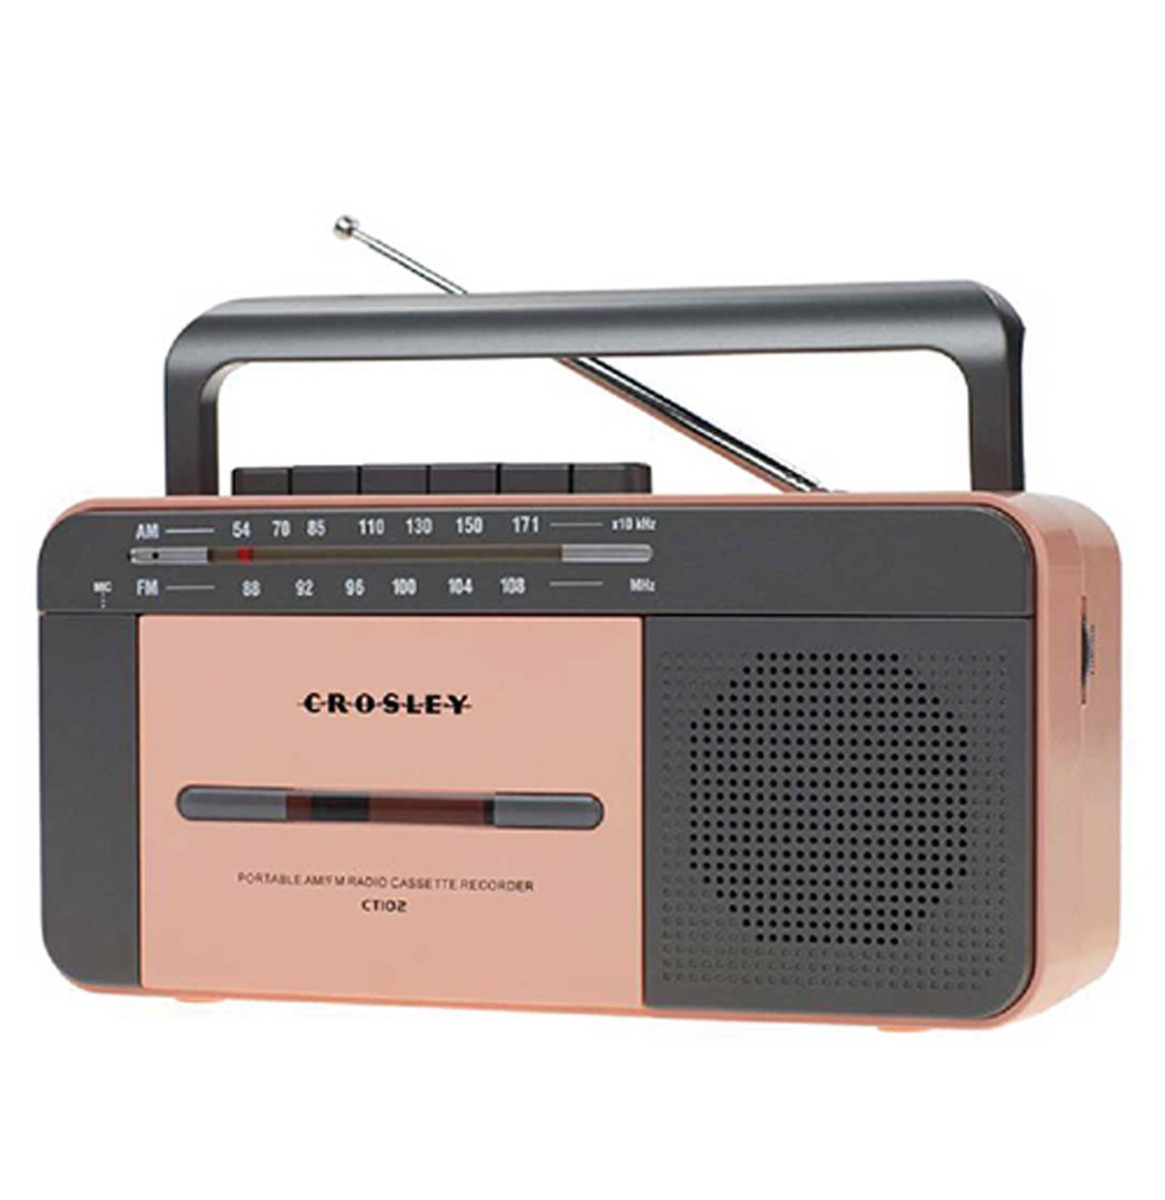 Crosley Draagbare Cassette Speler - Rose Goud/Grijs